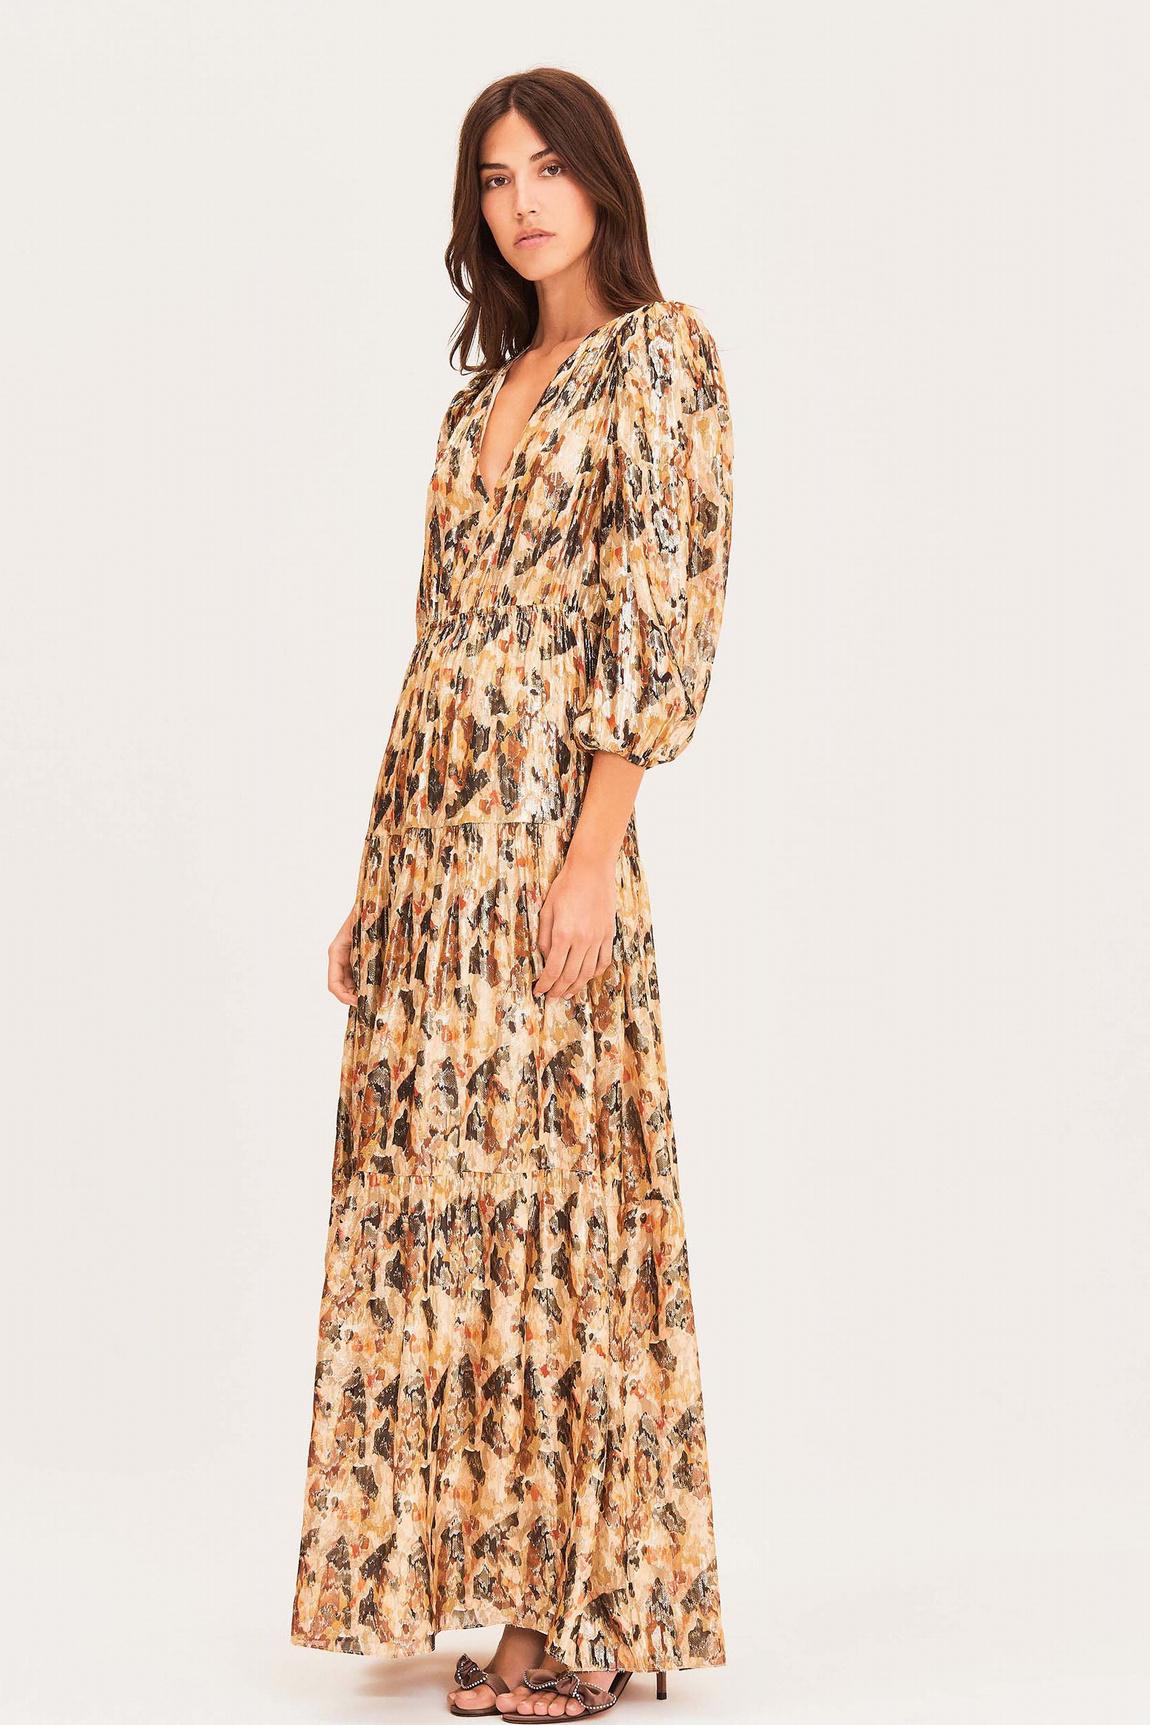 Gullian Dress - Oker-8